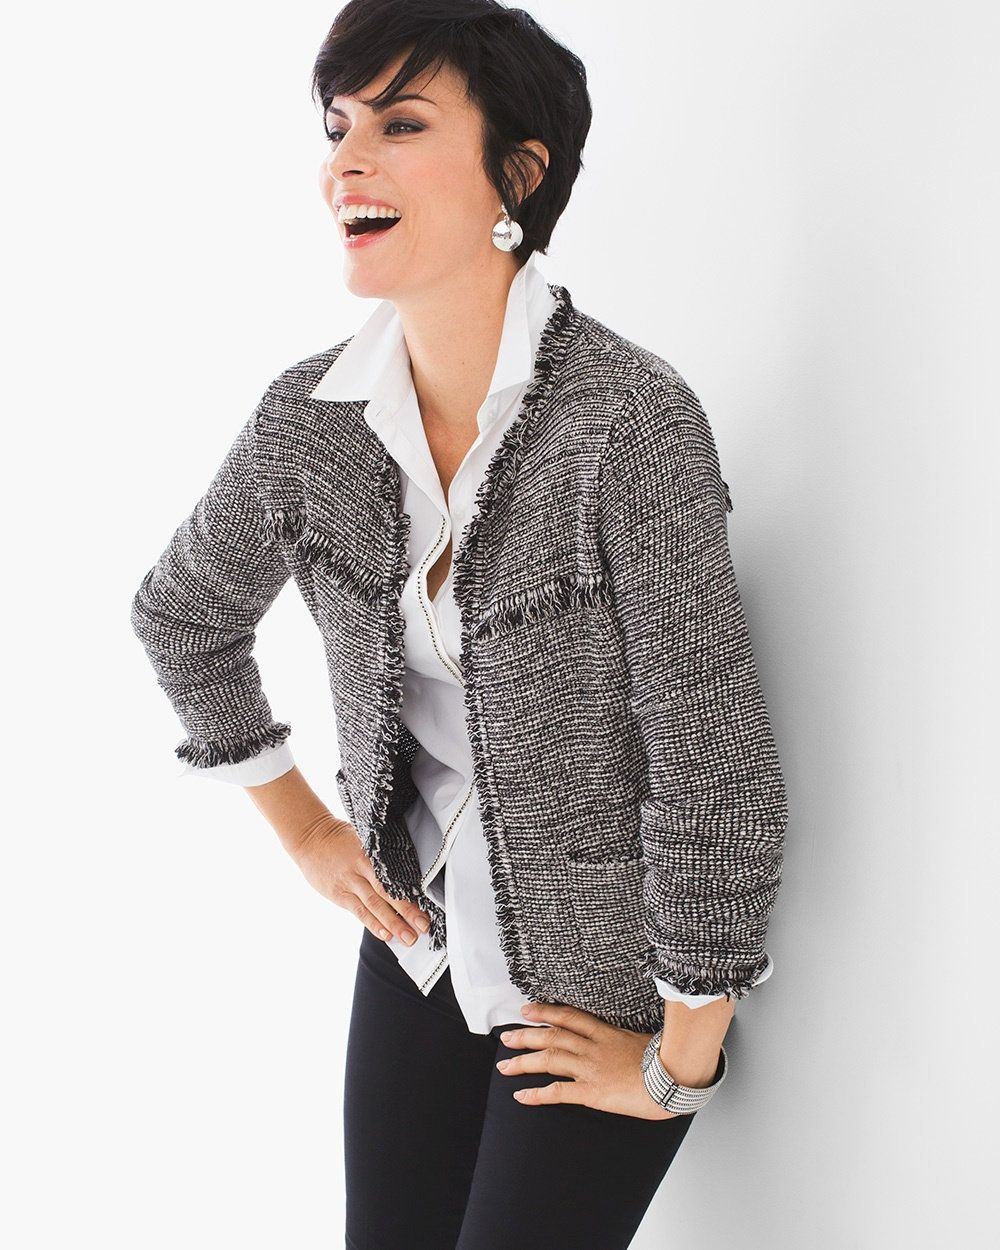 Chico's Women's Shawna Cardigan, Multi, Size: 0 (4/6 S) | Cardigans